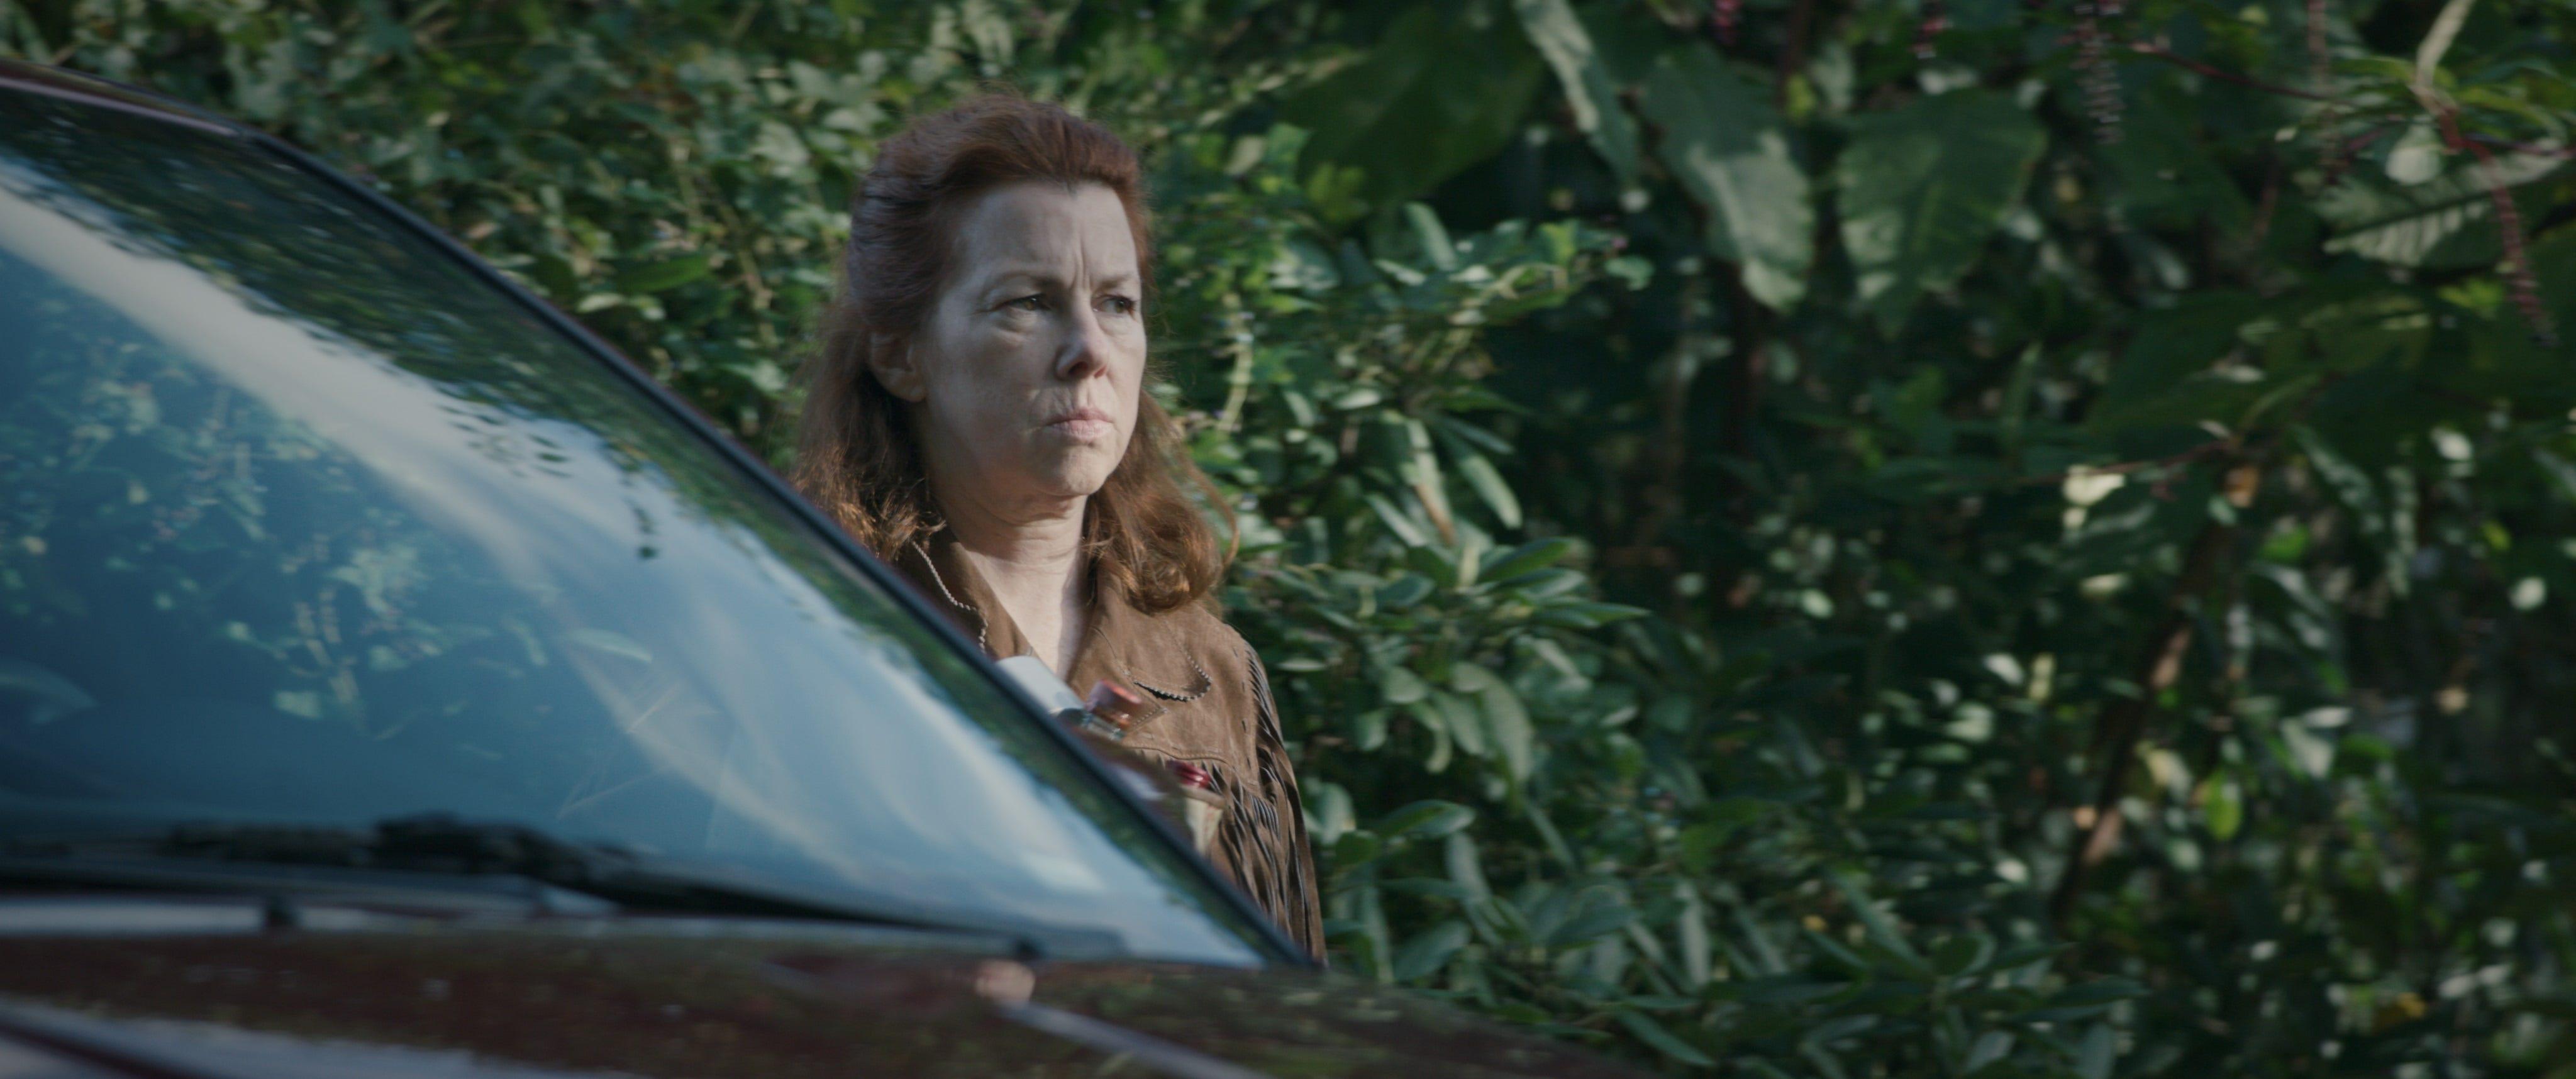 Siobhan Fallon Hogan of  Men in Black,   Forrest Gump  writes, stars in NJ film  Rushed